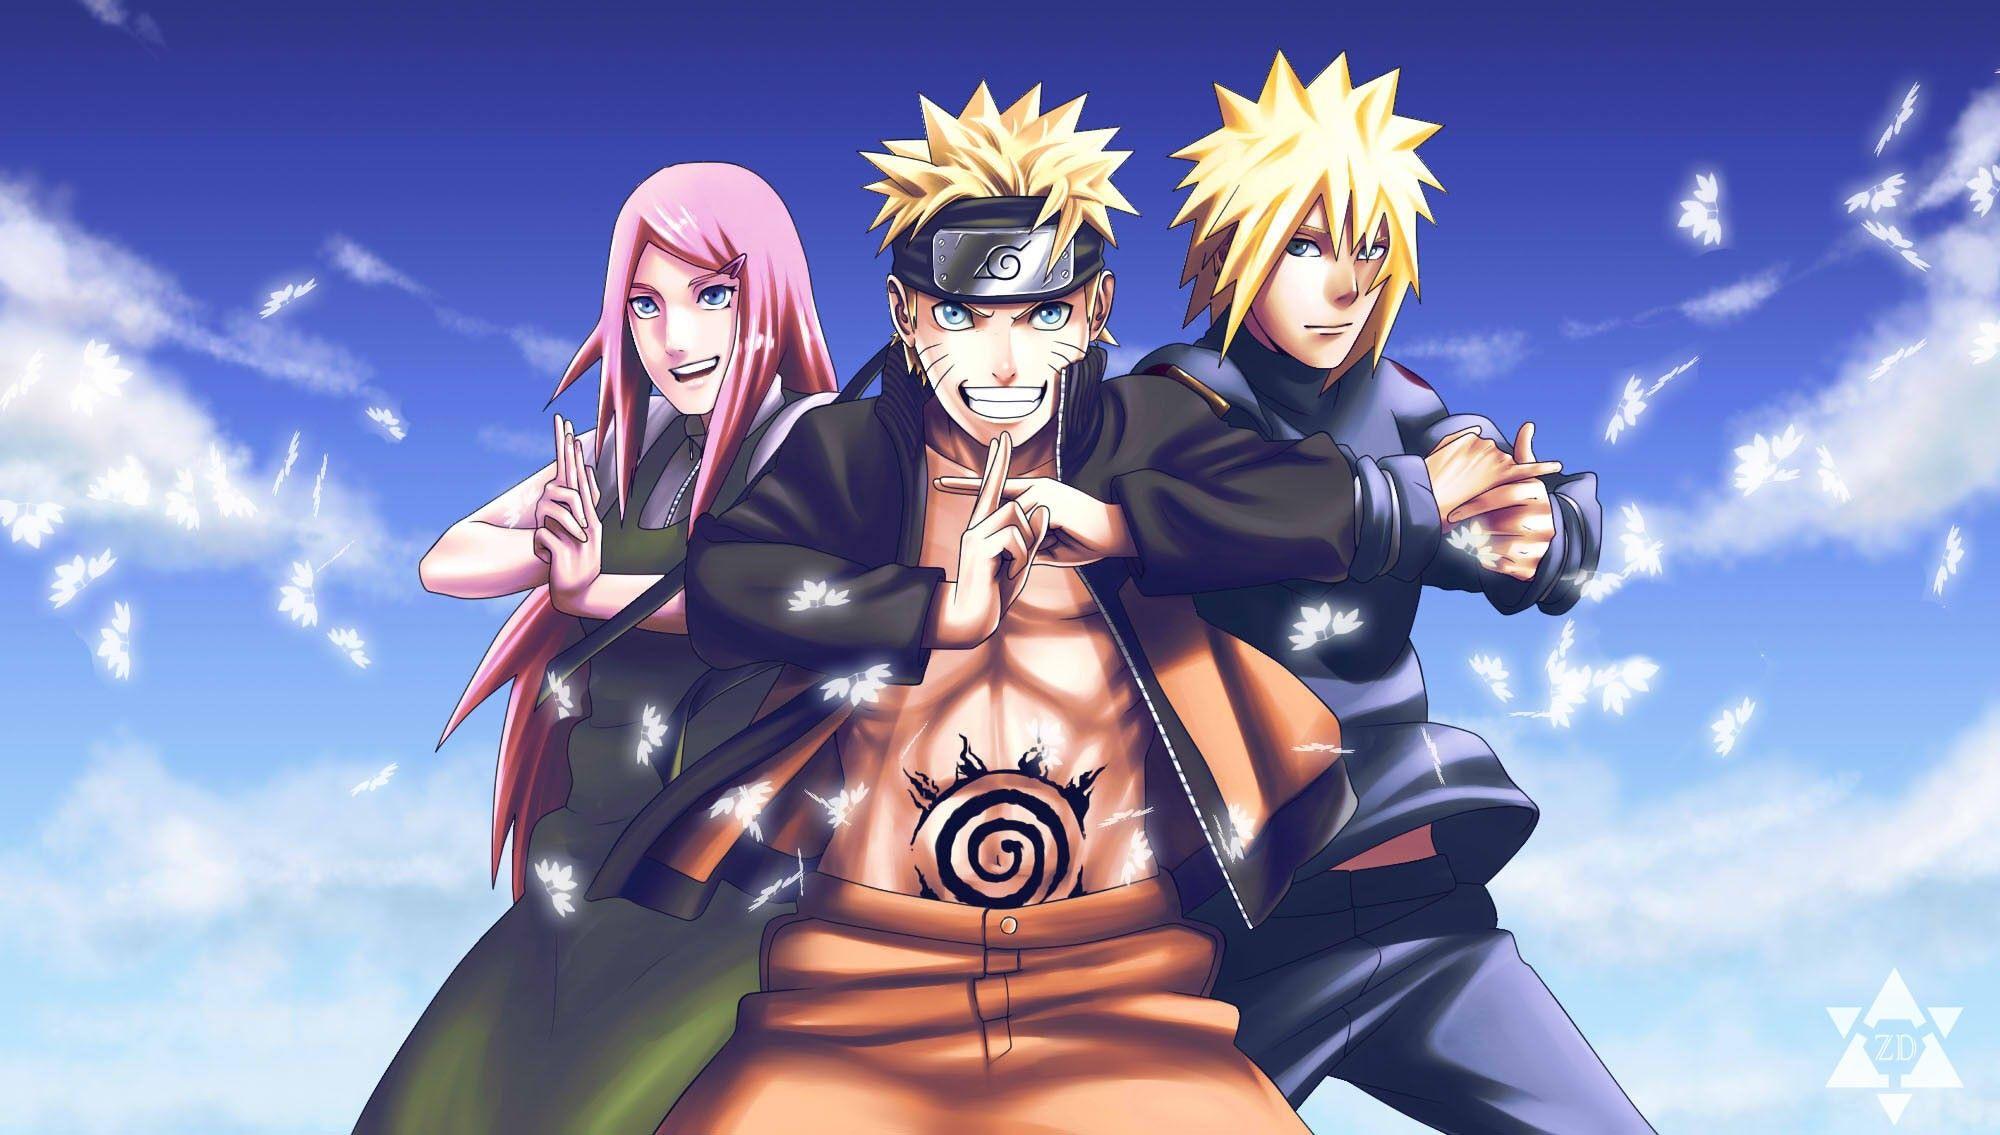 Telechargement En Cours Hebus Com Anime Naruto Naruto Et Sasuke